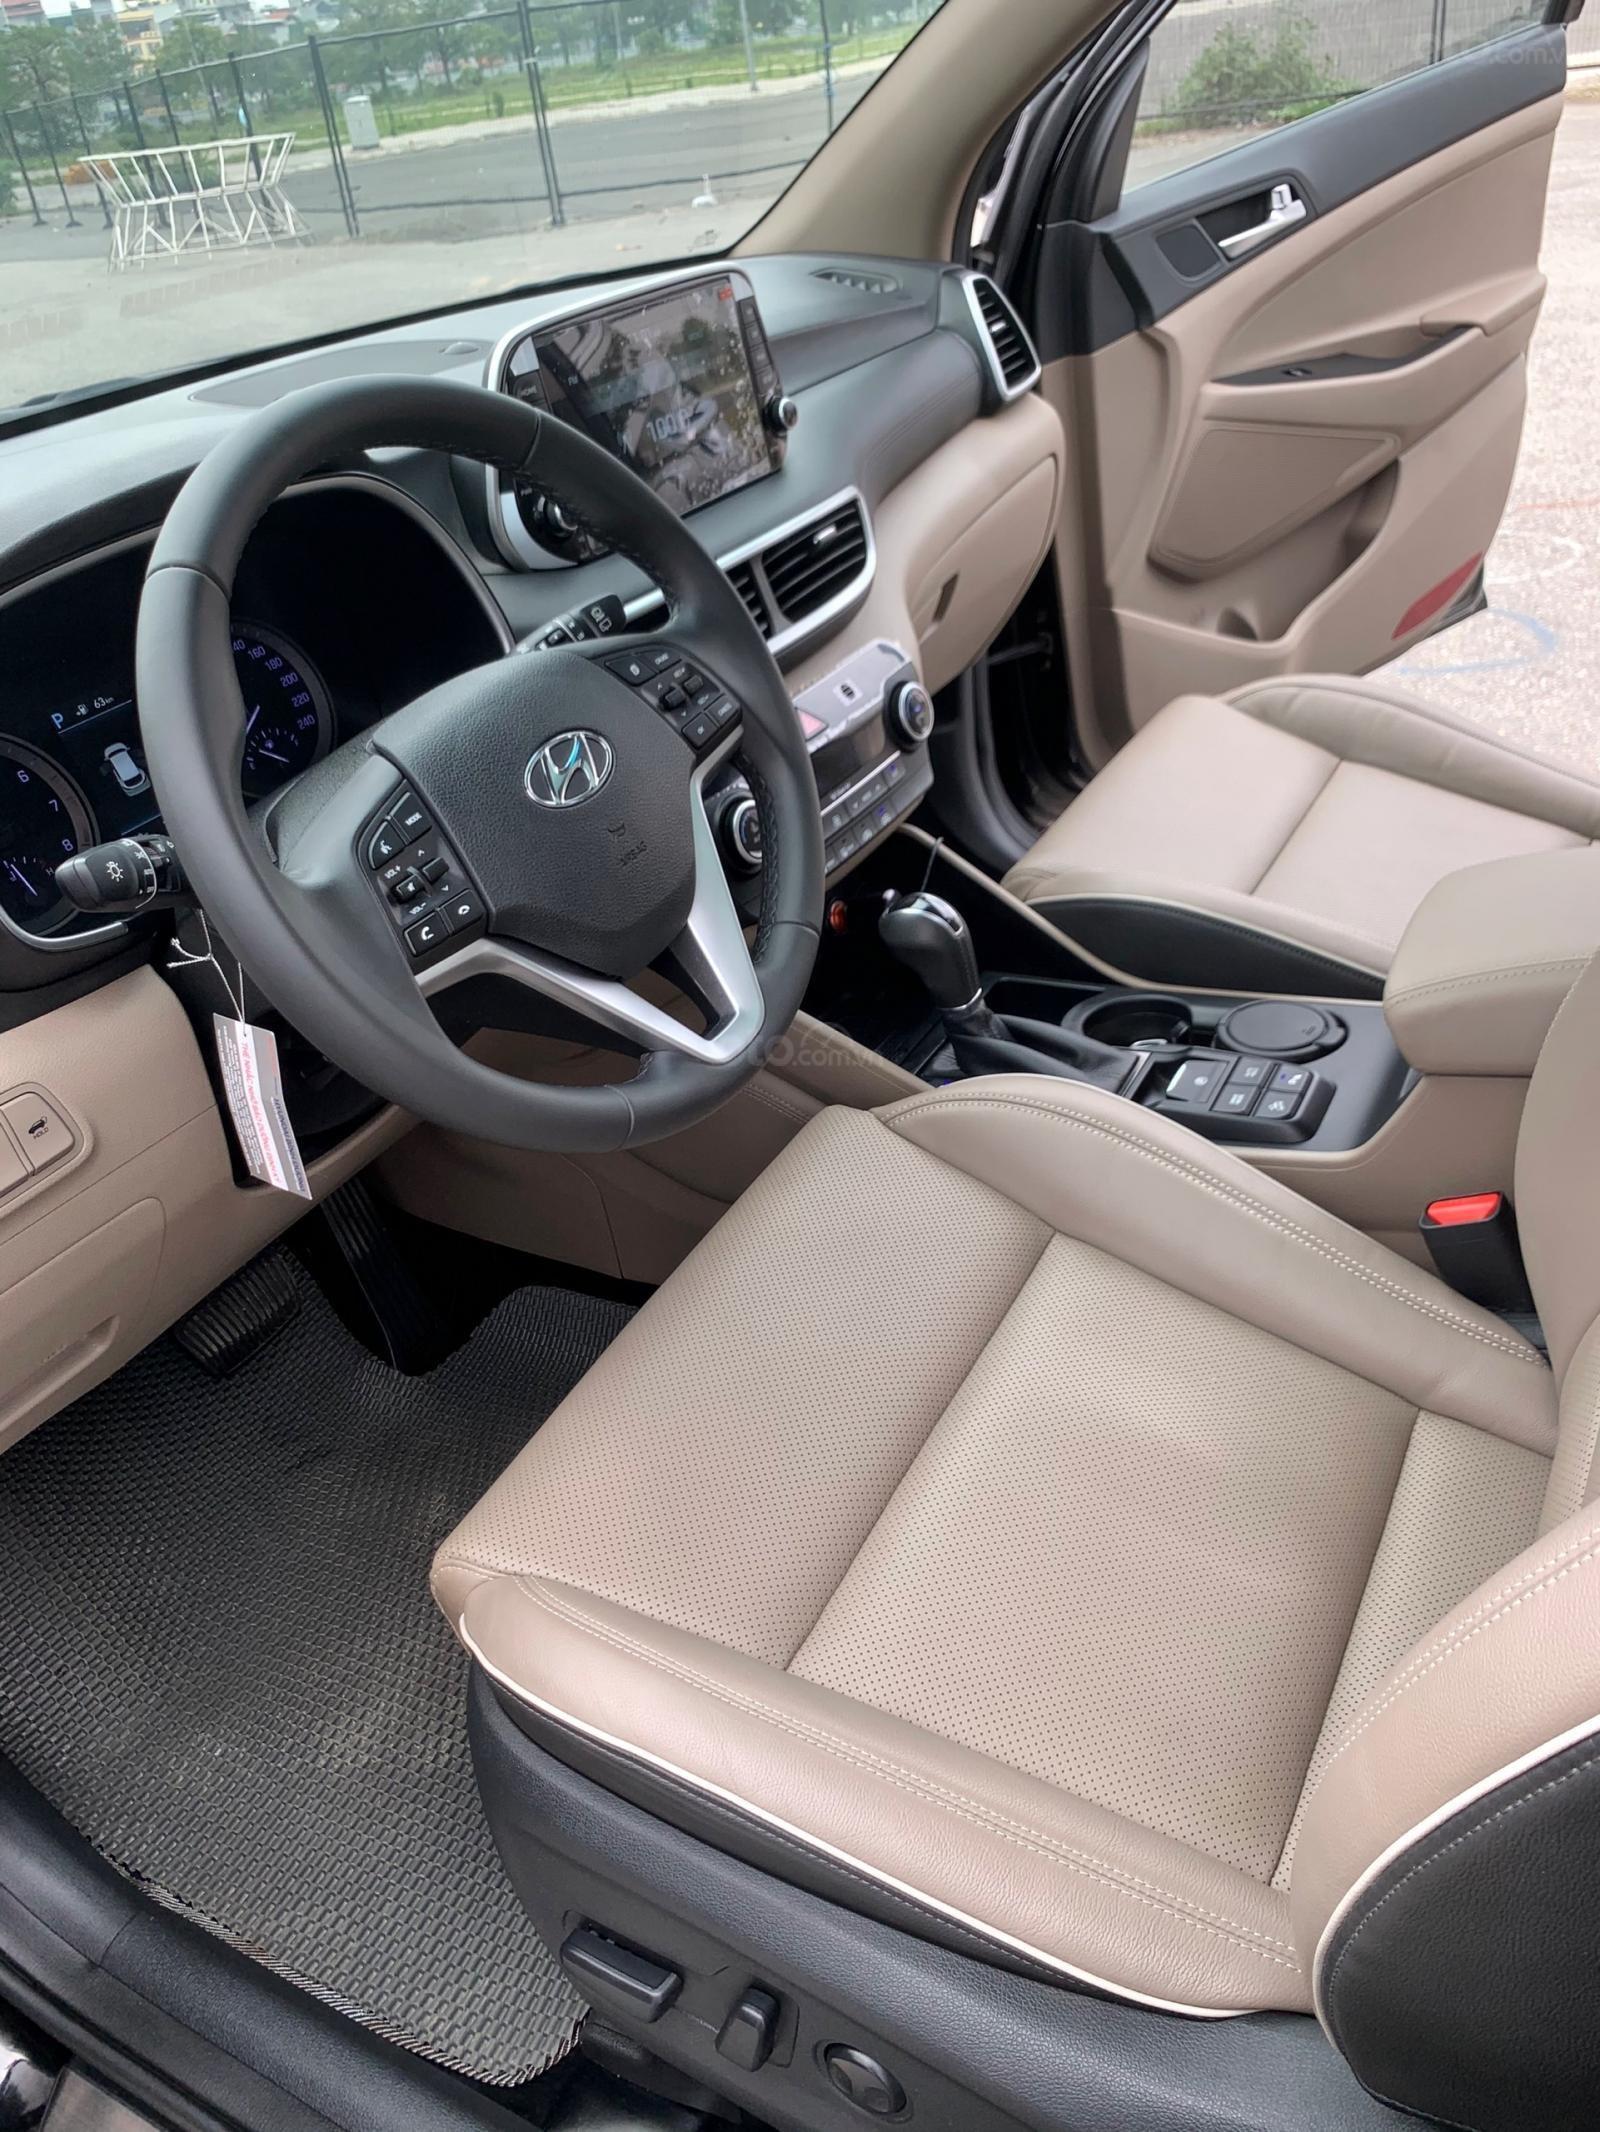 Cần bán gấp Hyundai Tucson 1.6 Turbo sx năm 2019, 878 triệu (10)